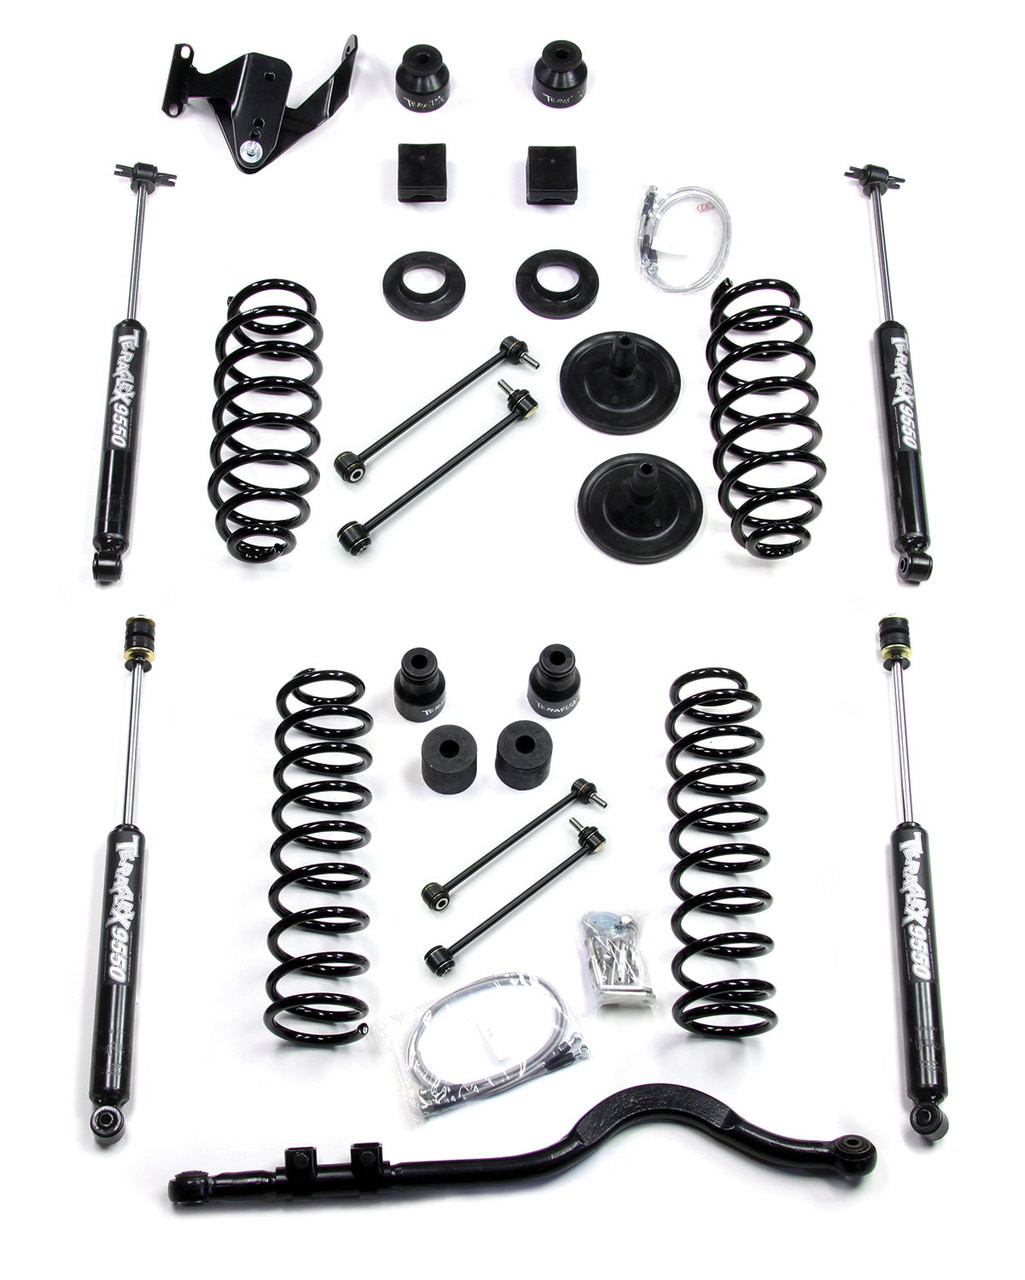 "TeraFlex 1251400 4"" Lift Kit with 9550 Shocks and Trackbar for Jeep Wrangler JK 4 Door 2007-2016"